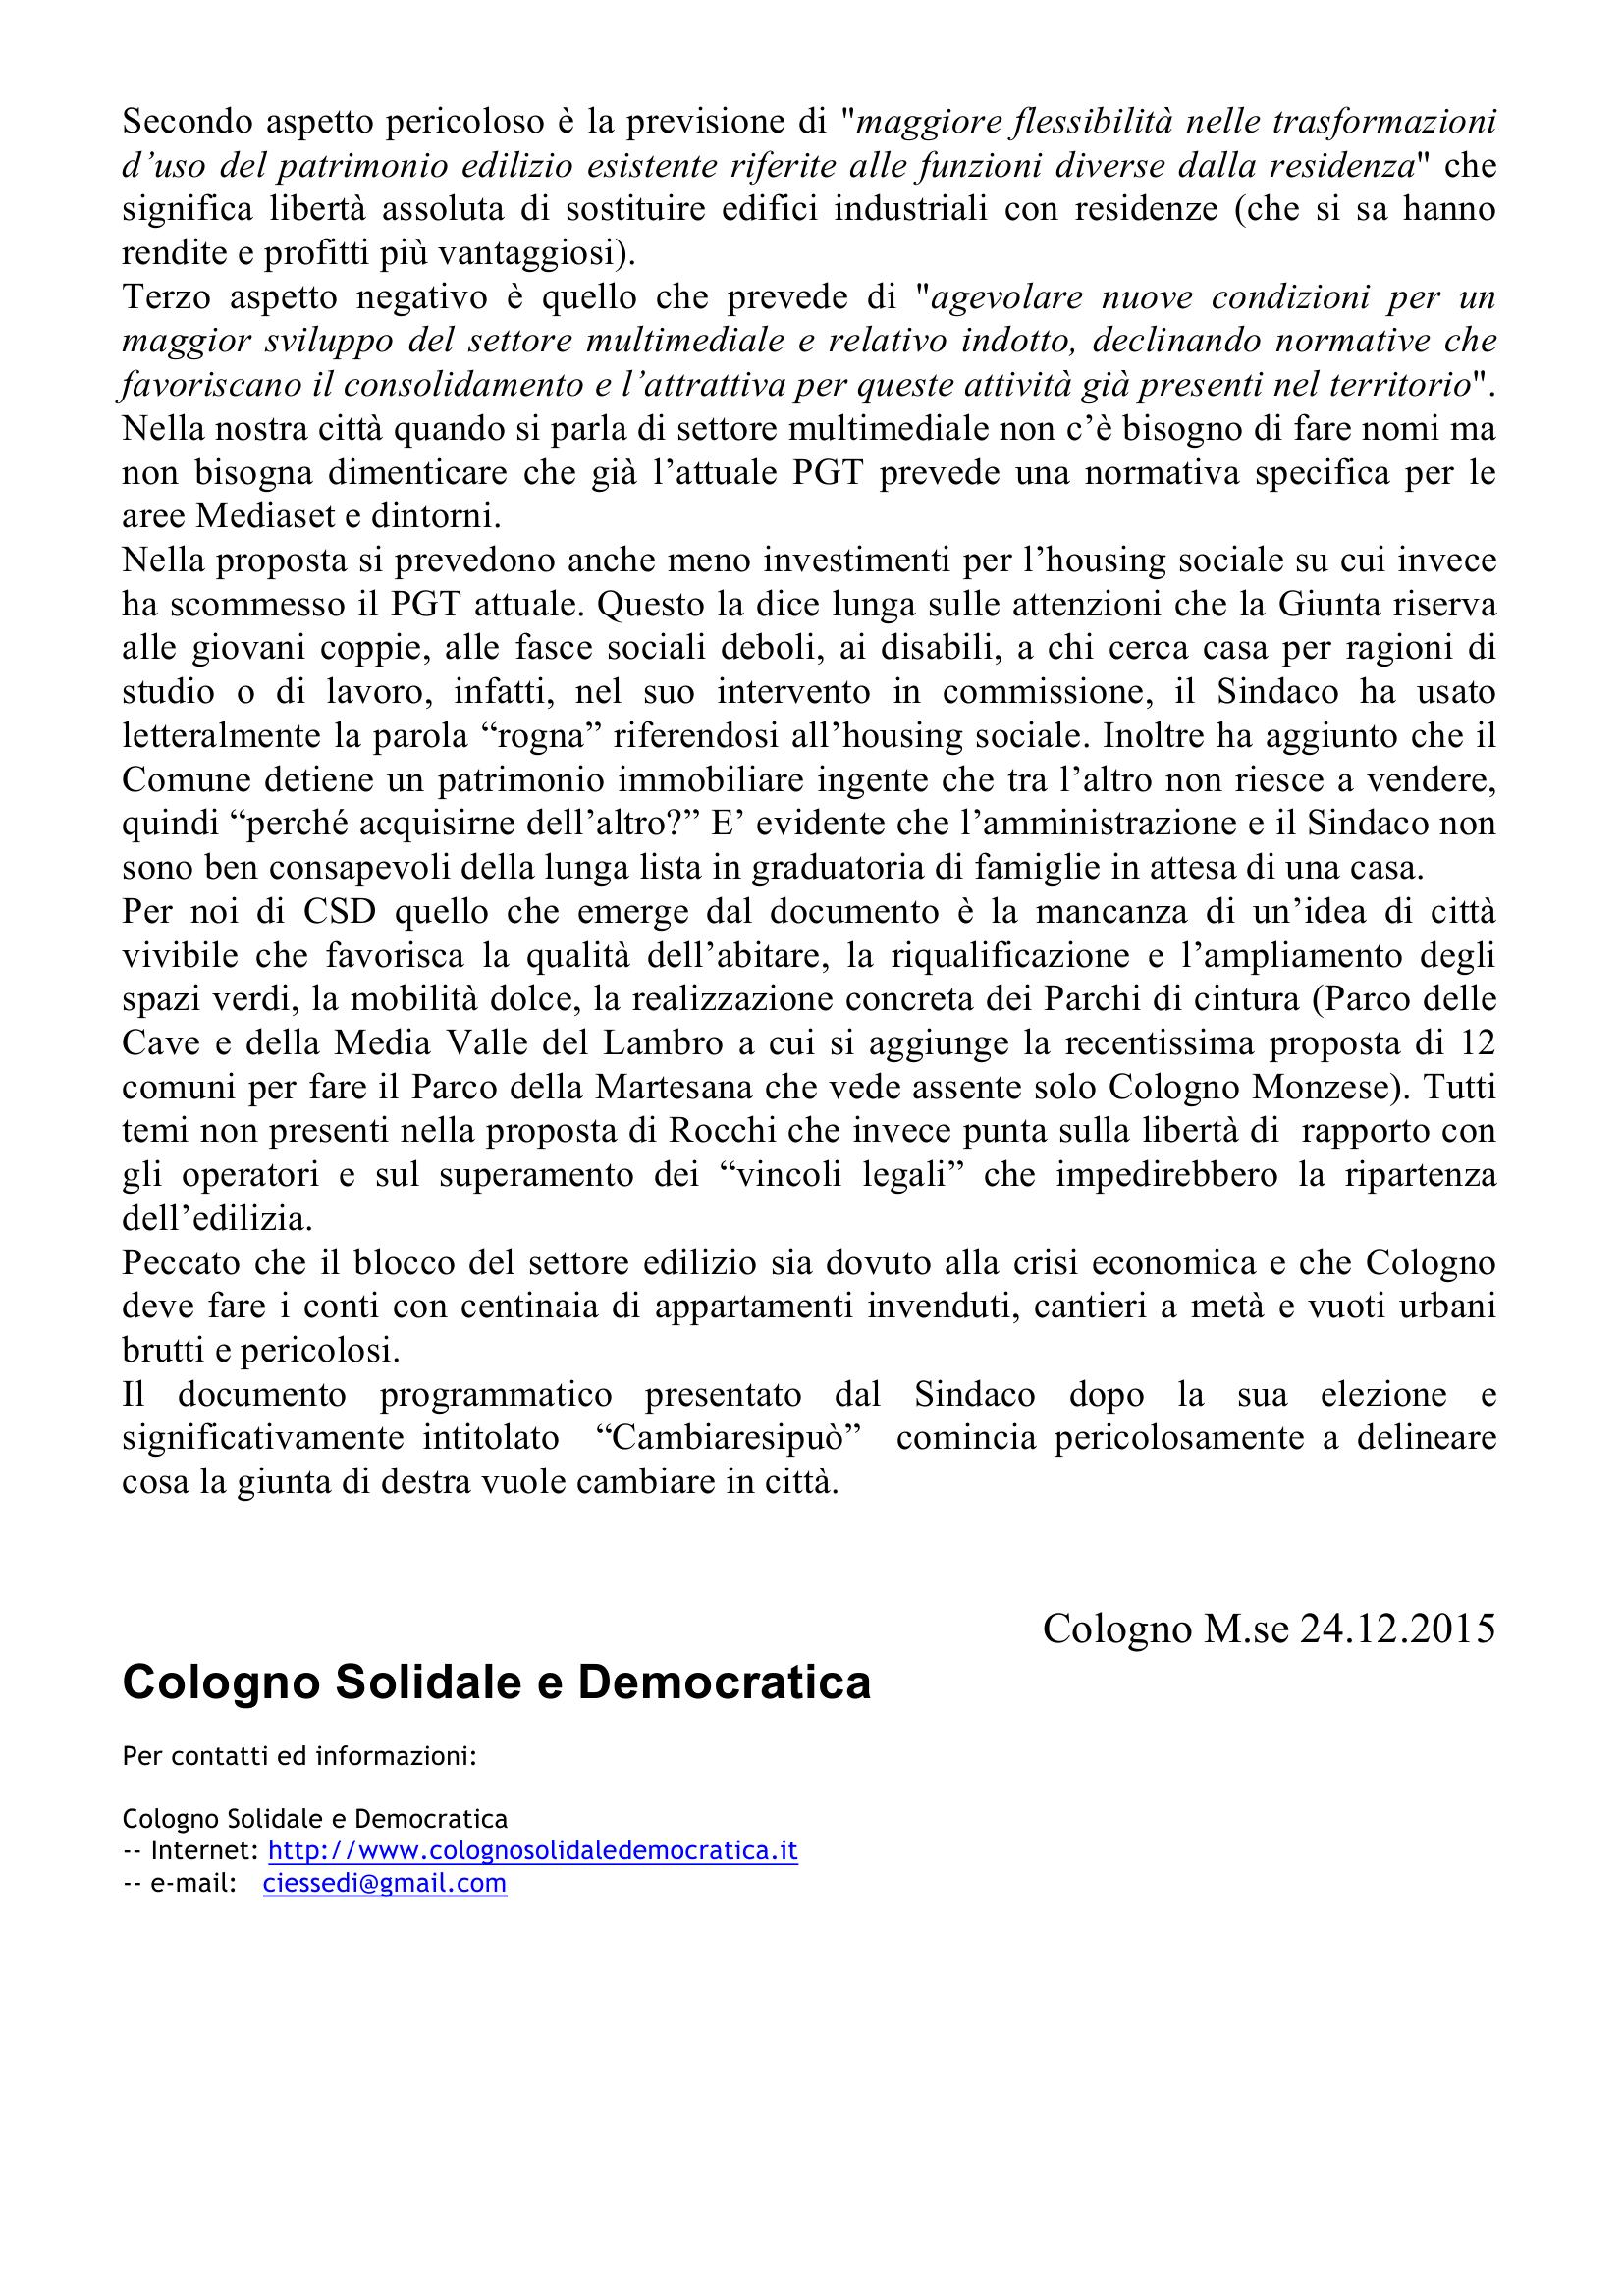 ComunicatoStampaCSDsuVariantePGT2